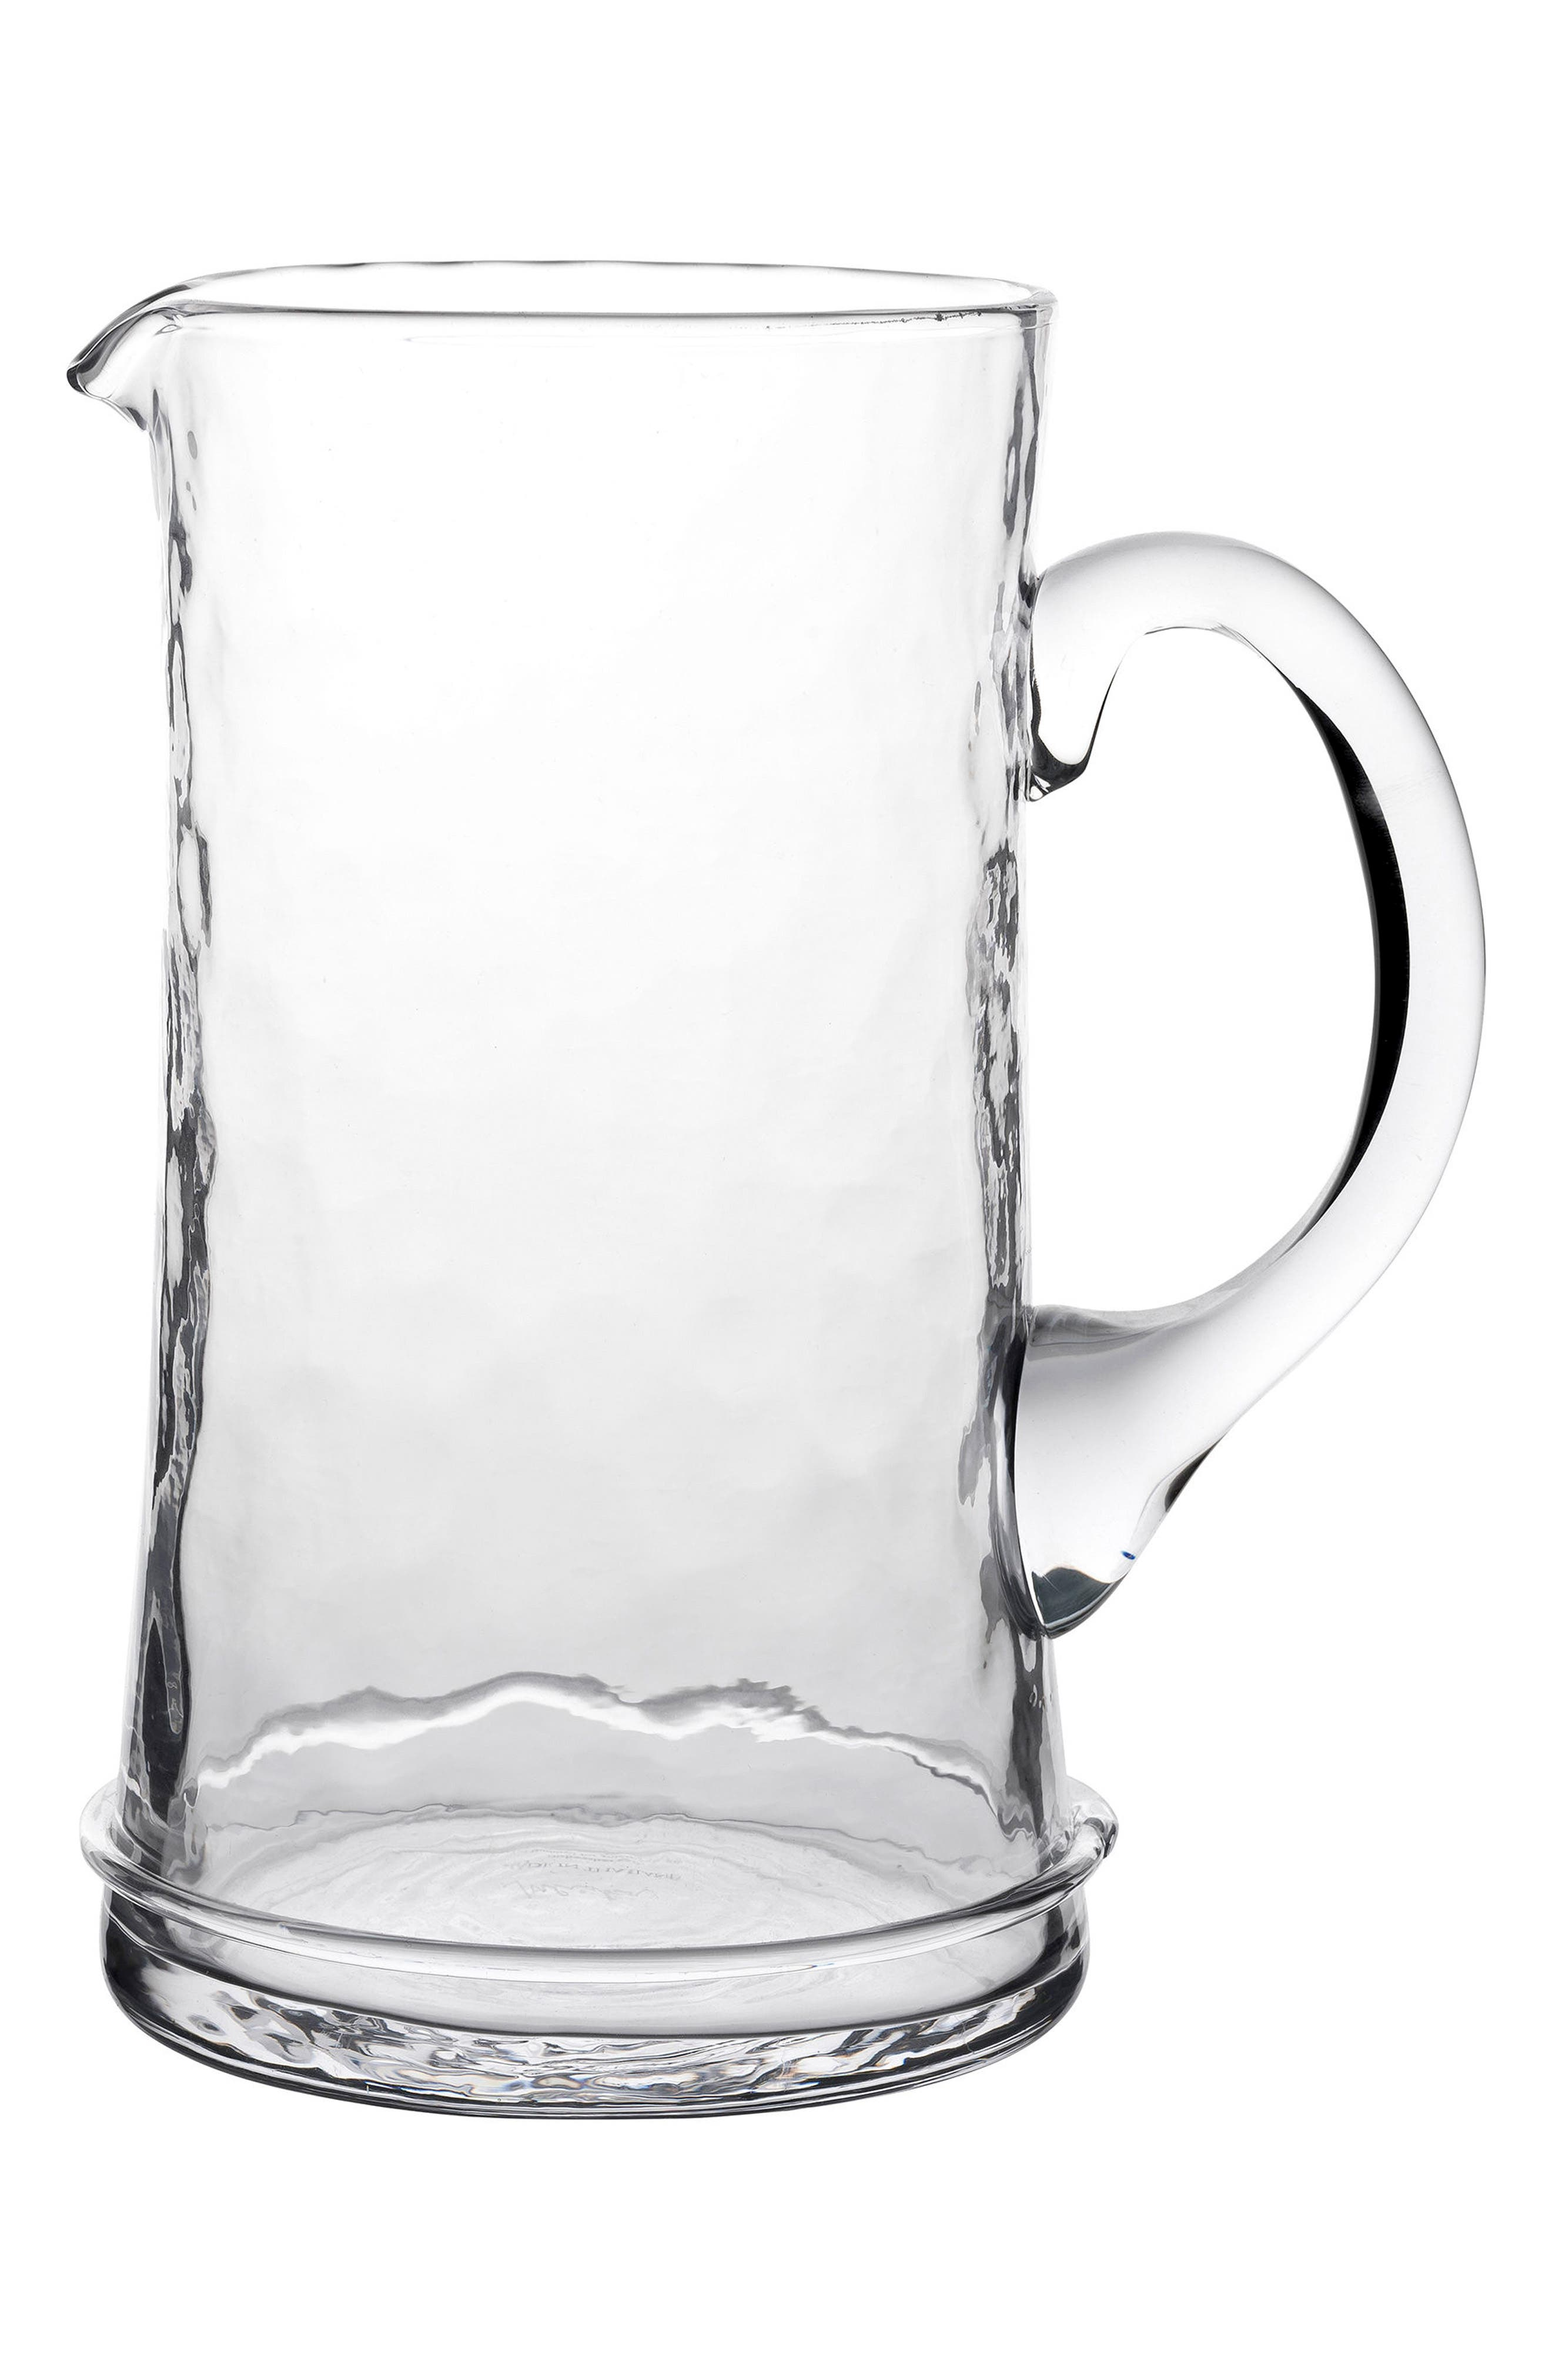 Main Image - Juliska 'Carine' Glass Pitcher